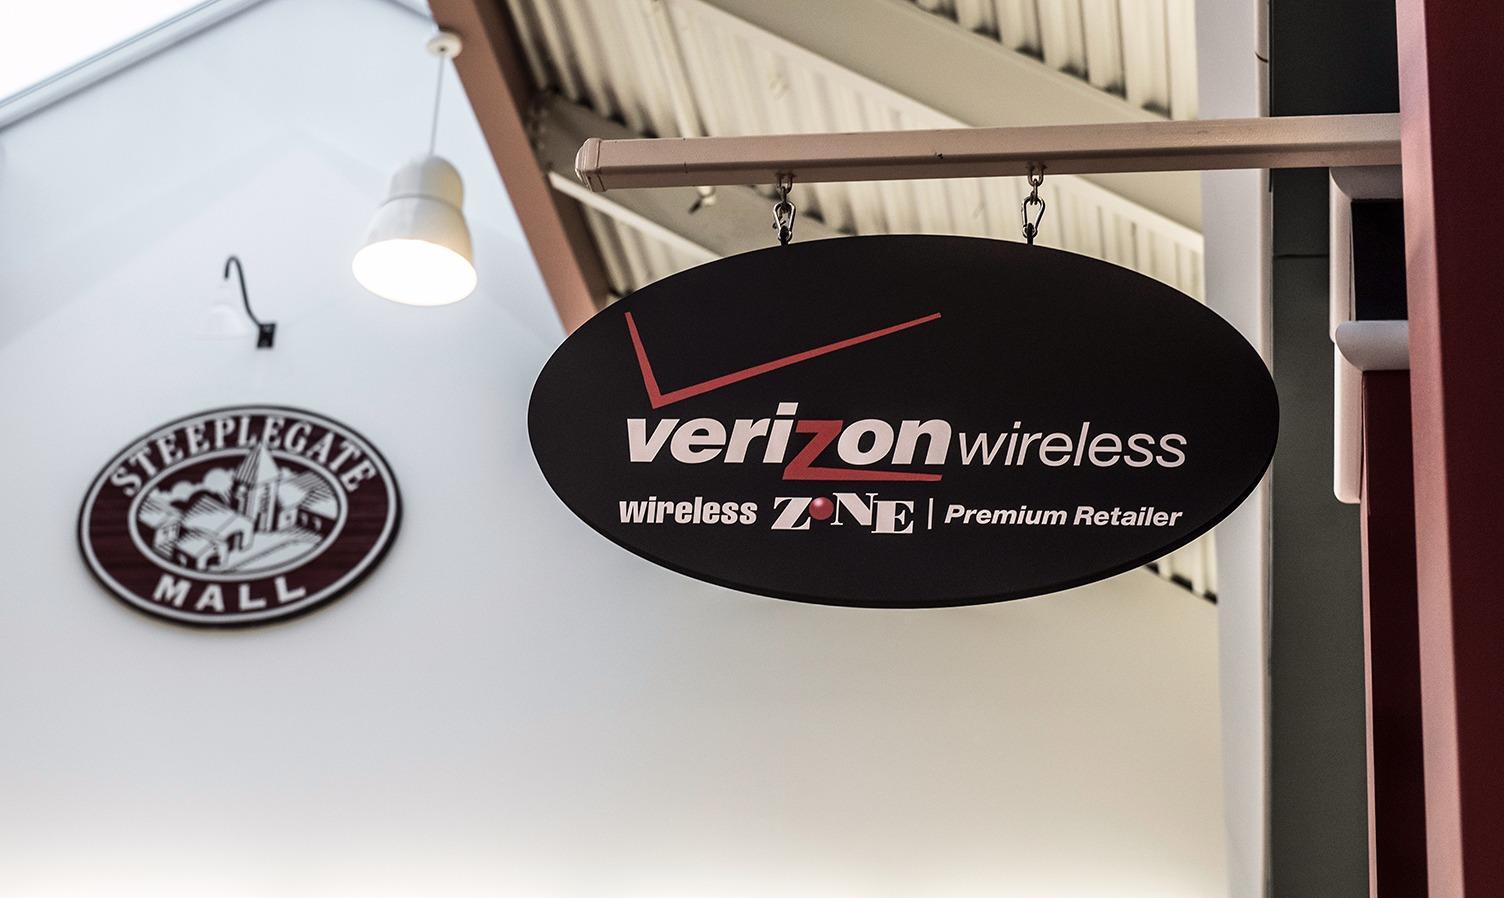 Verizon Authorized Retailer - Wireless Zone image 8